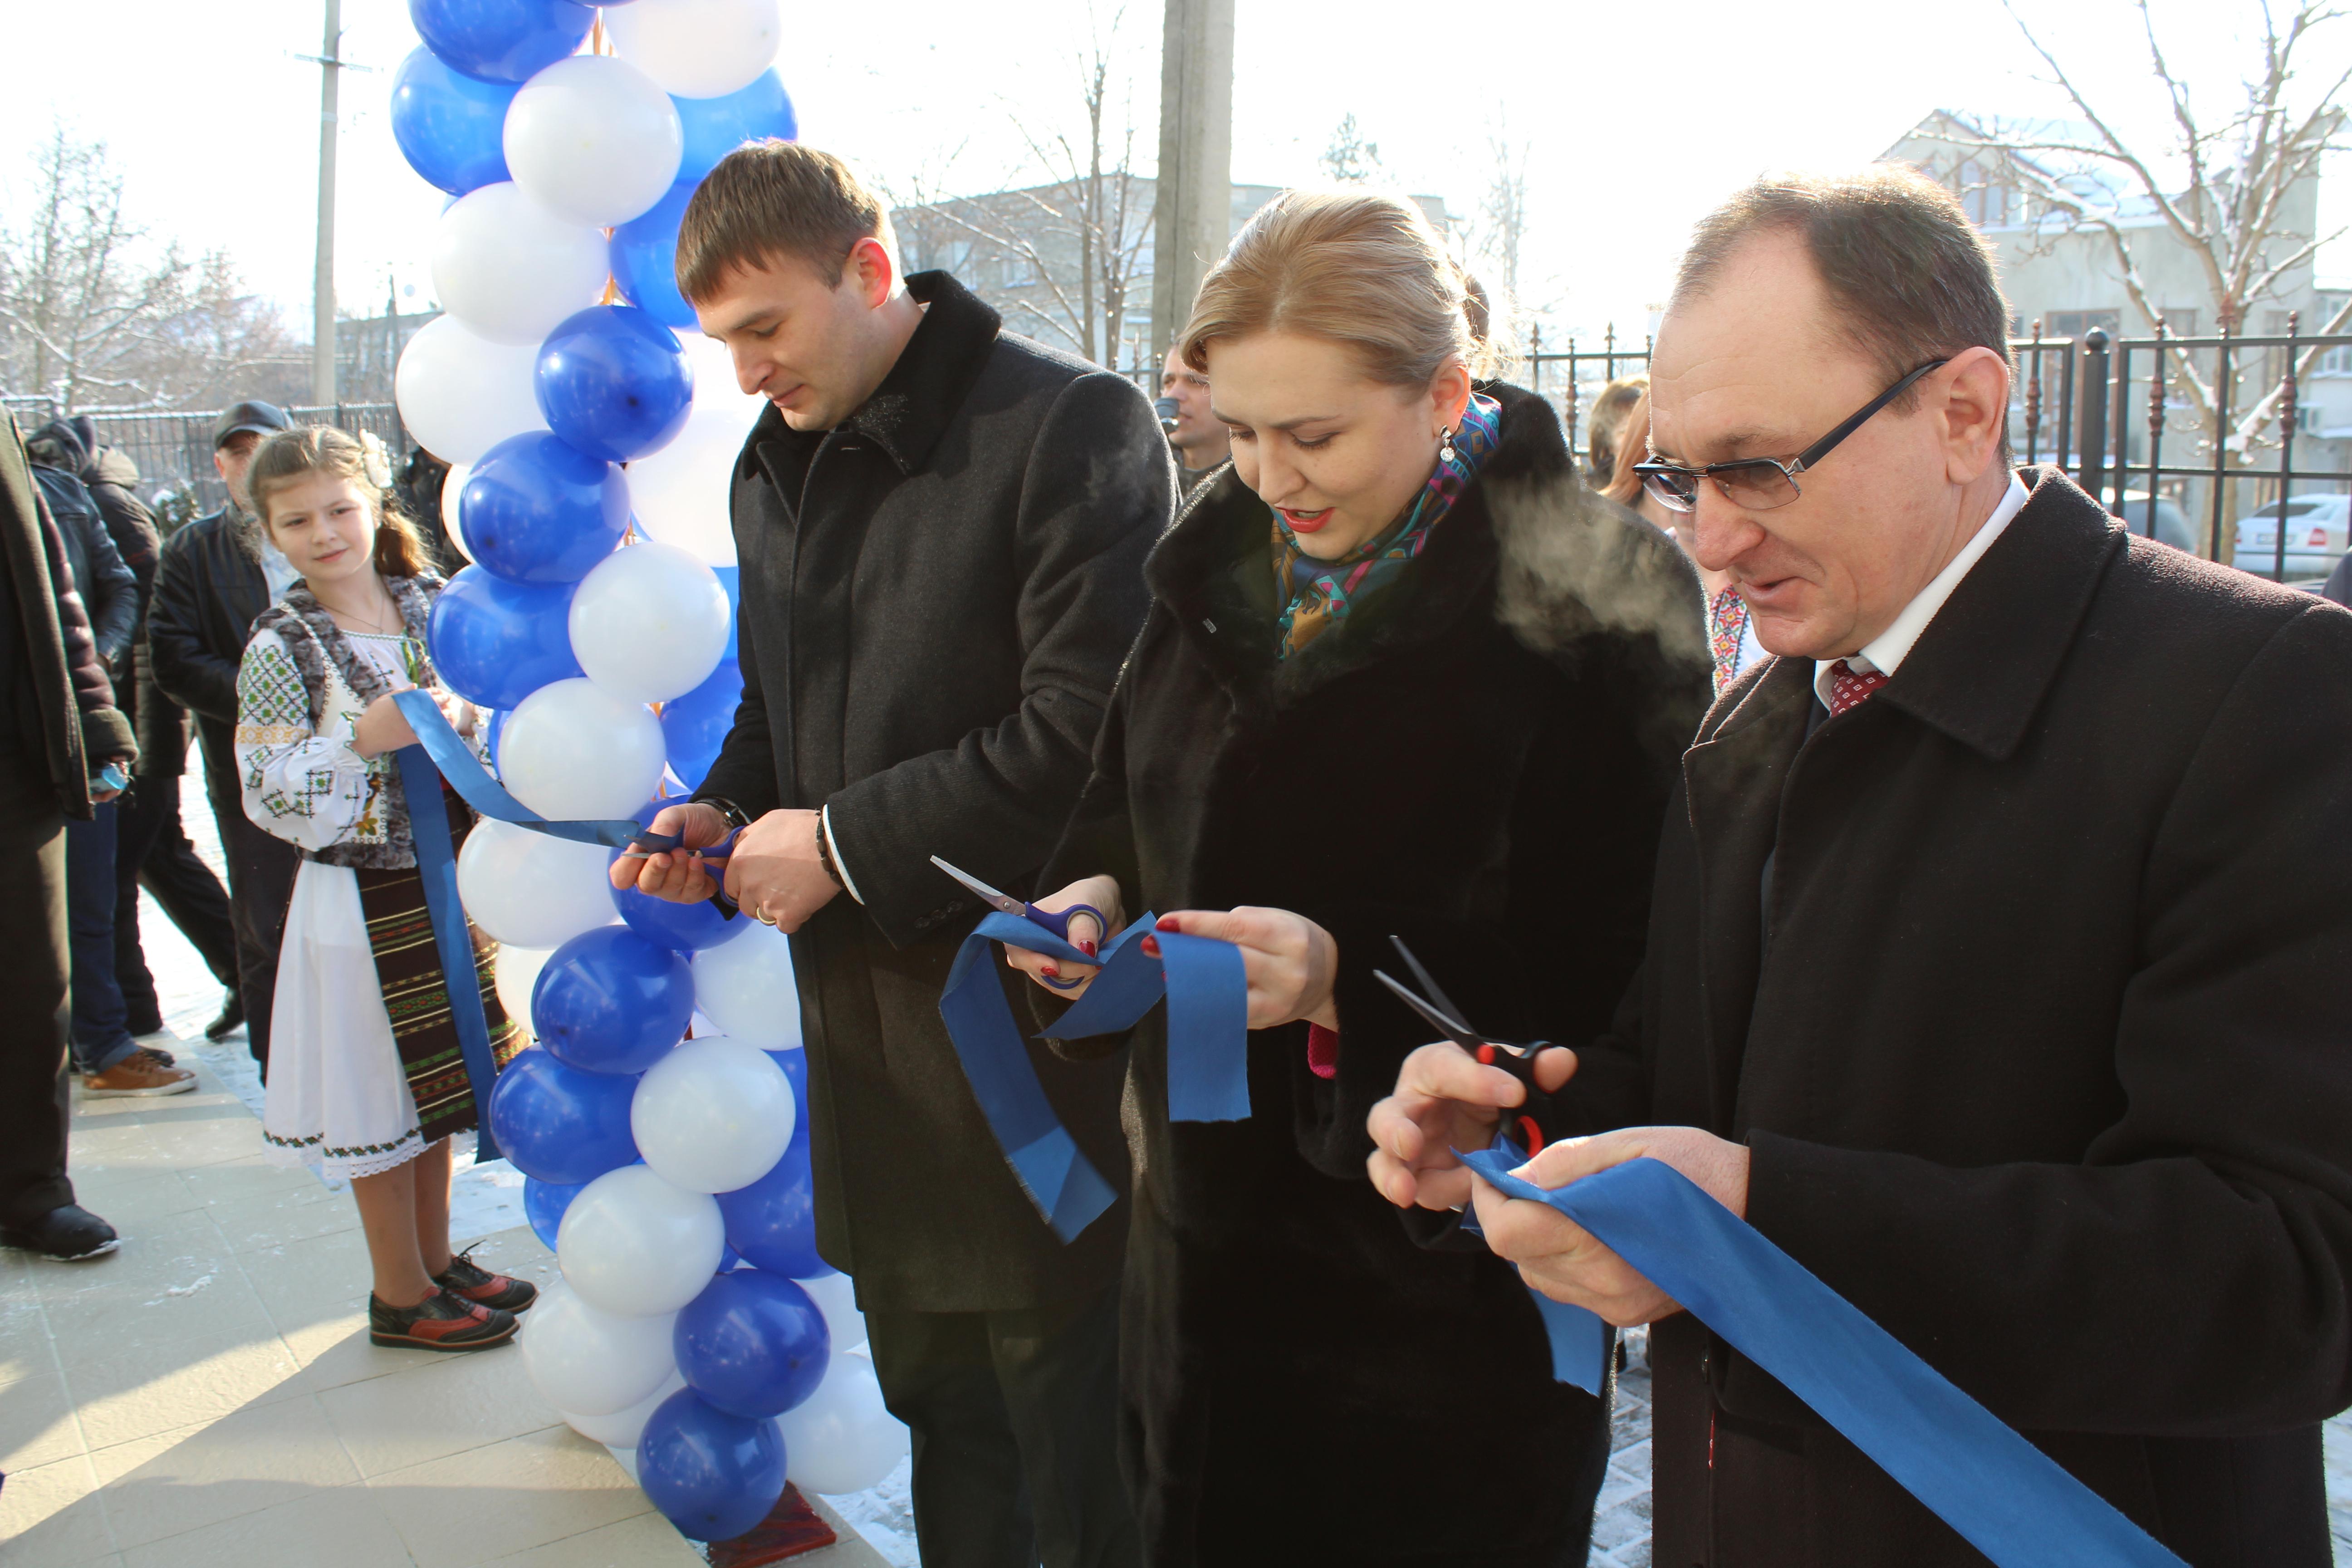 A fost inaugurat noul sediu al substației AMU Cimișlia